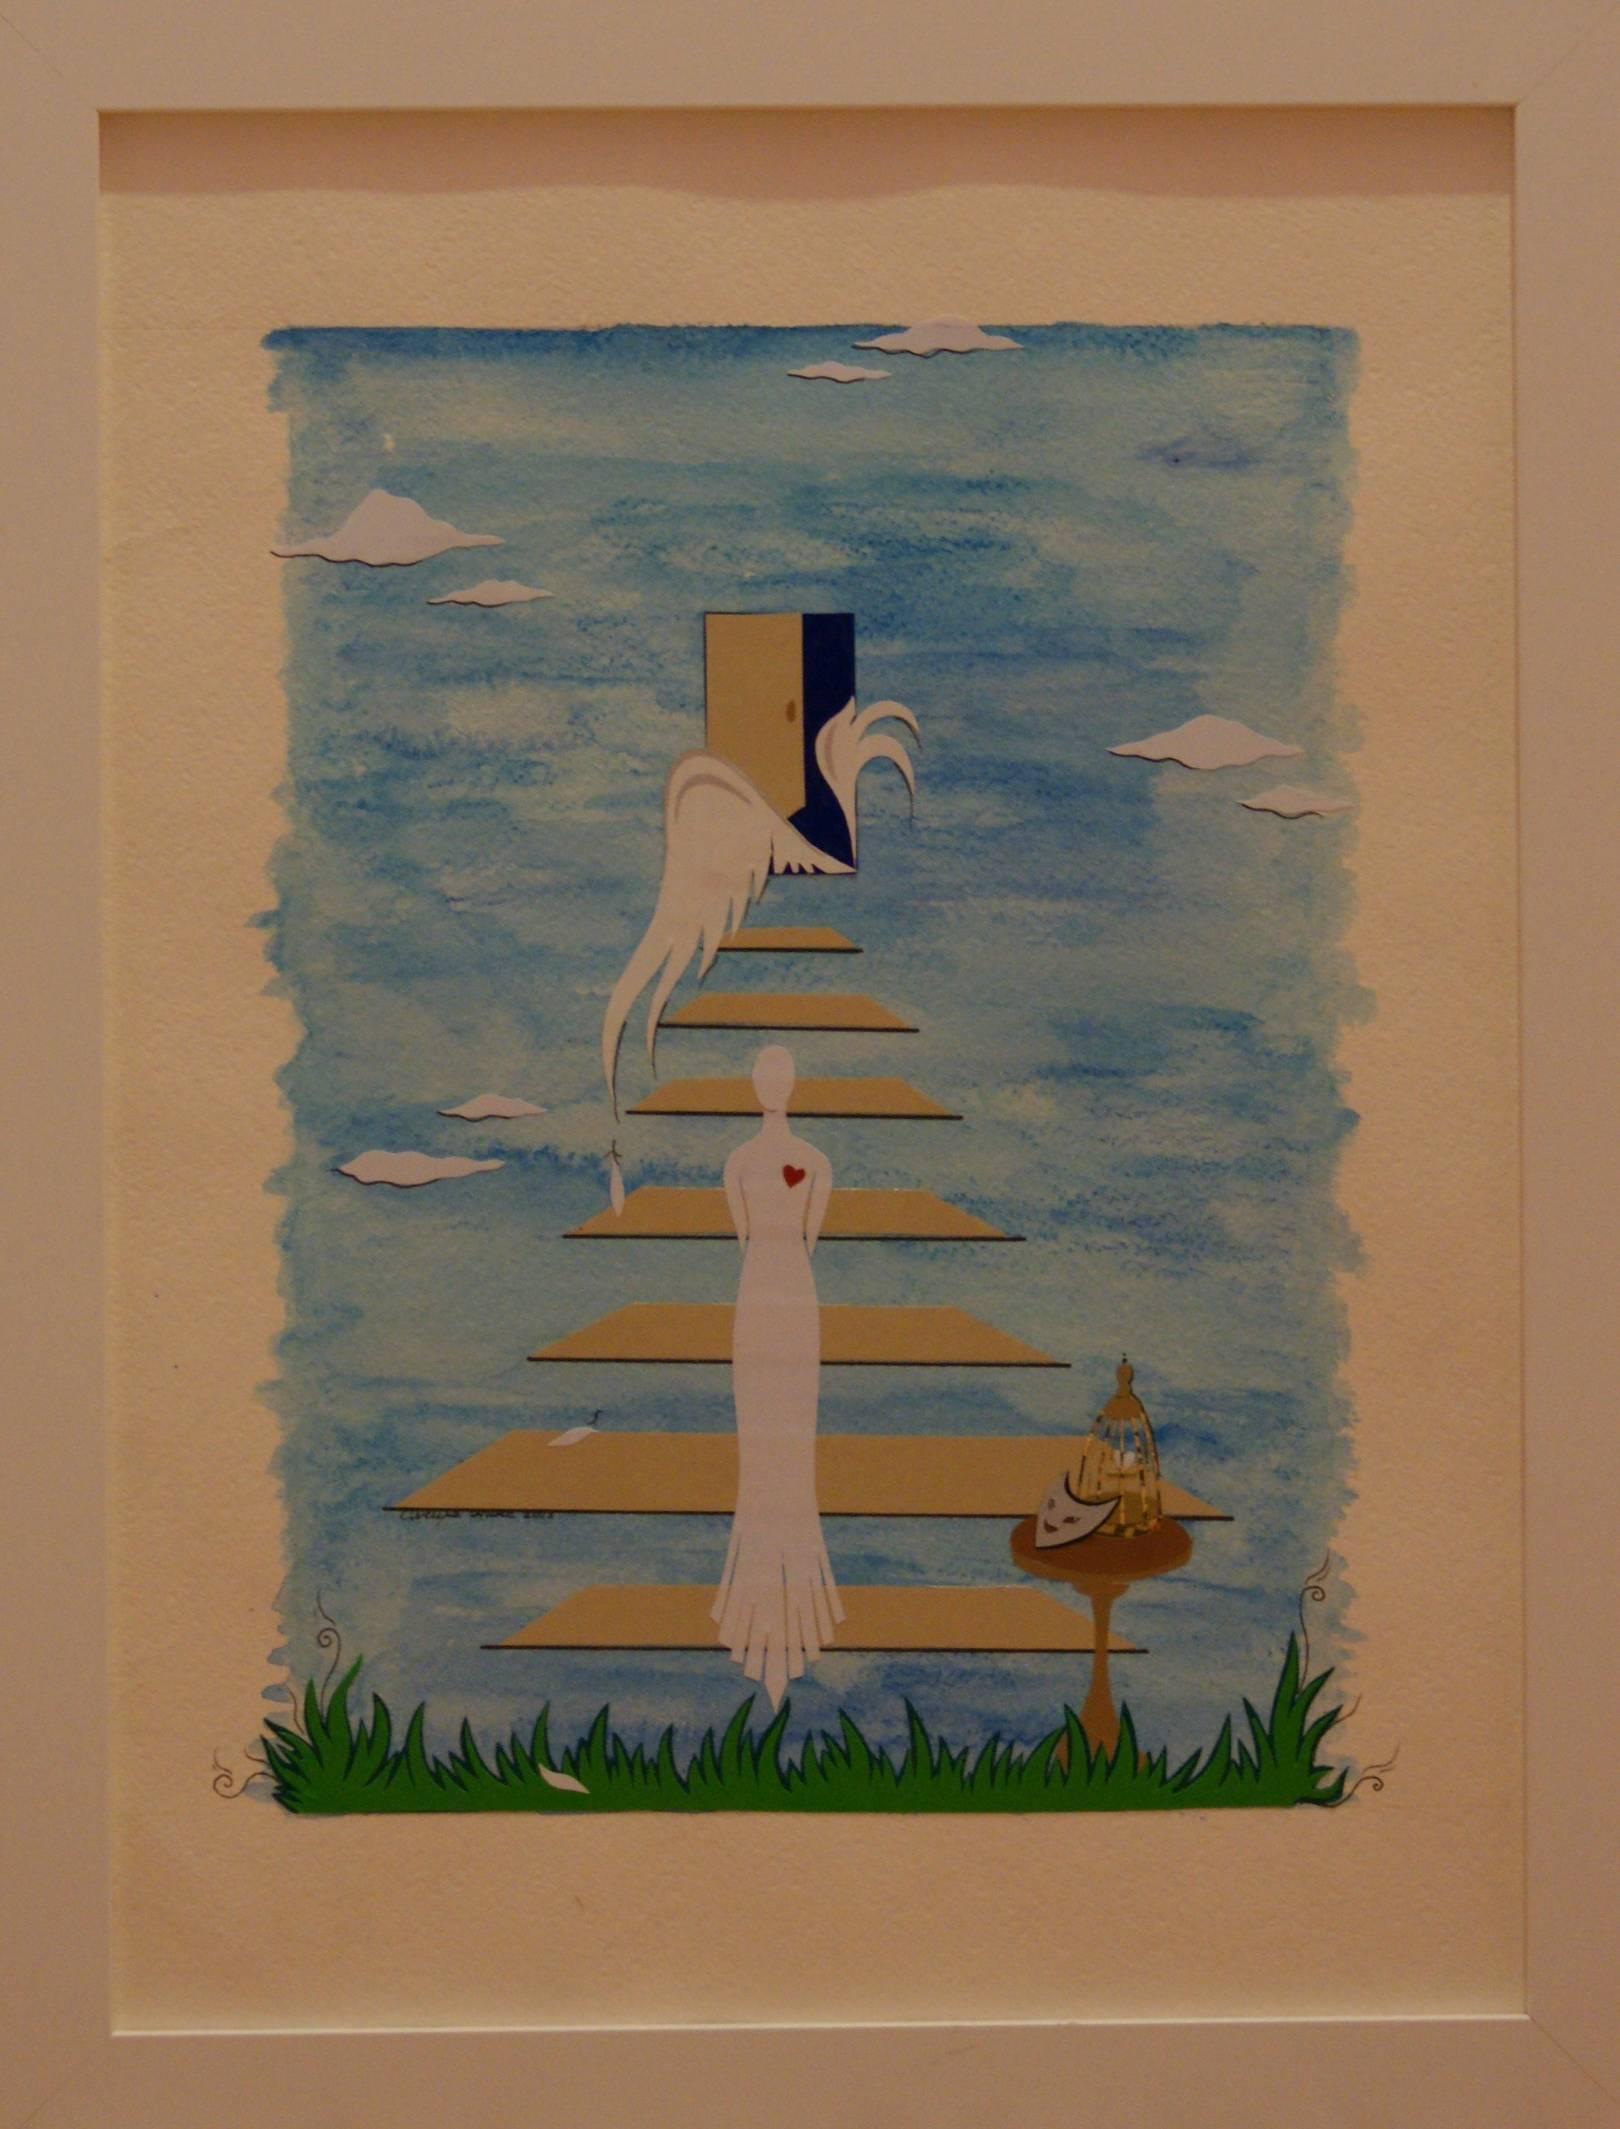 Illustrations (my poems to the works of other authors),Иллюстрации (к моим стихам  произведениям других авторов)